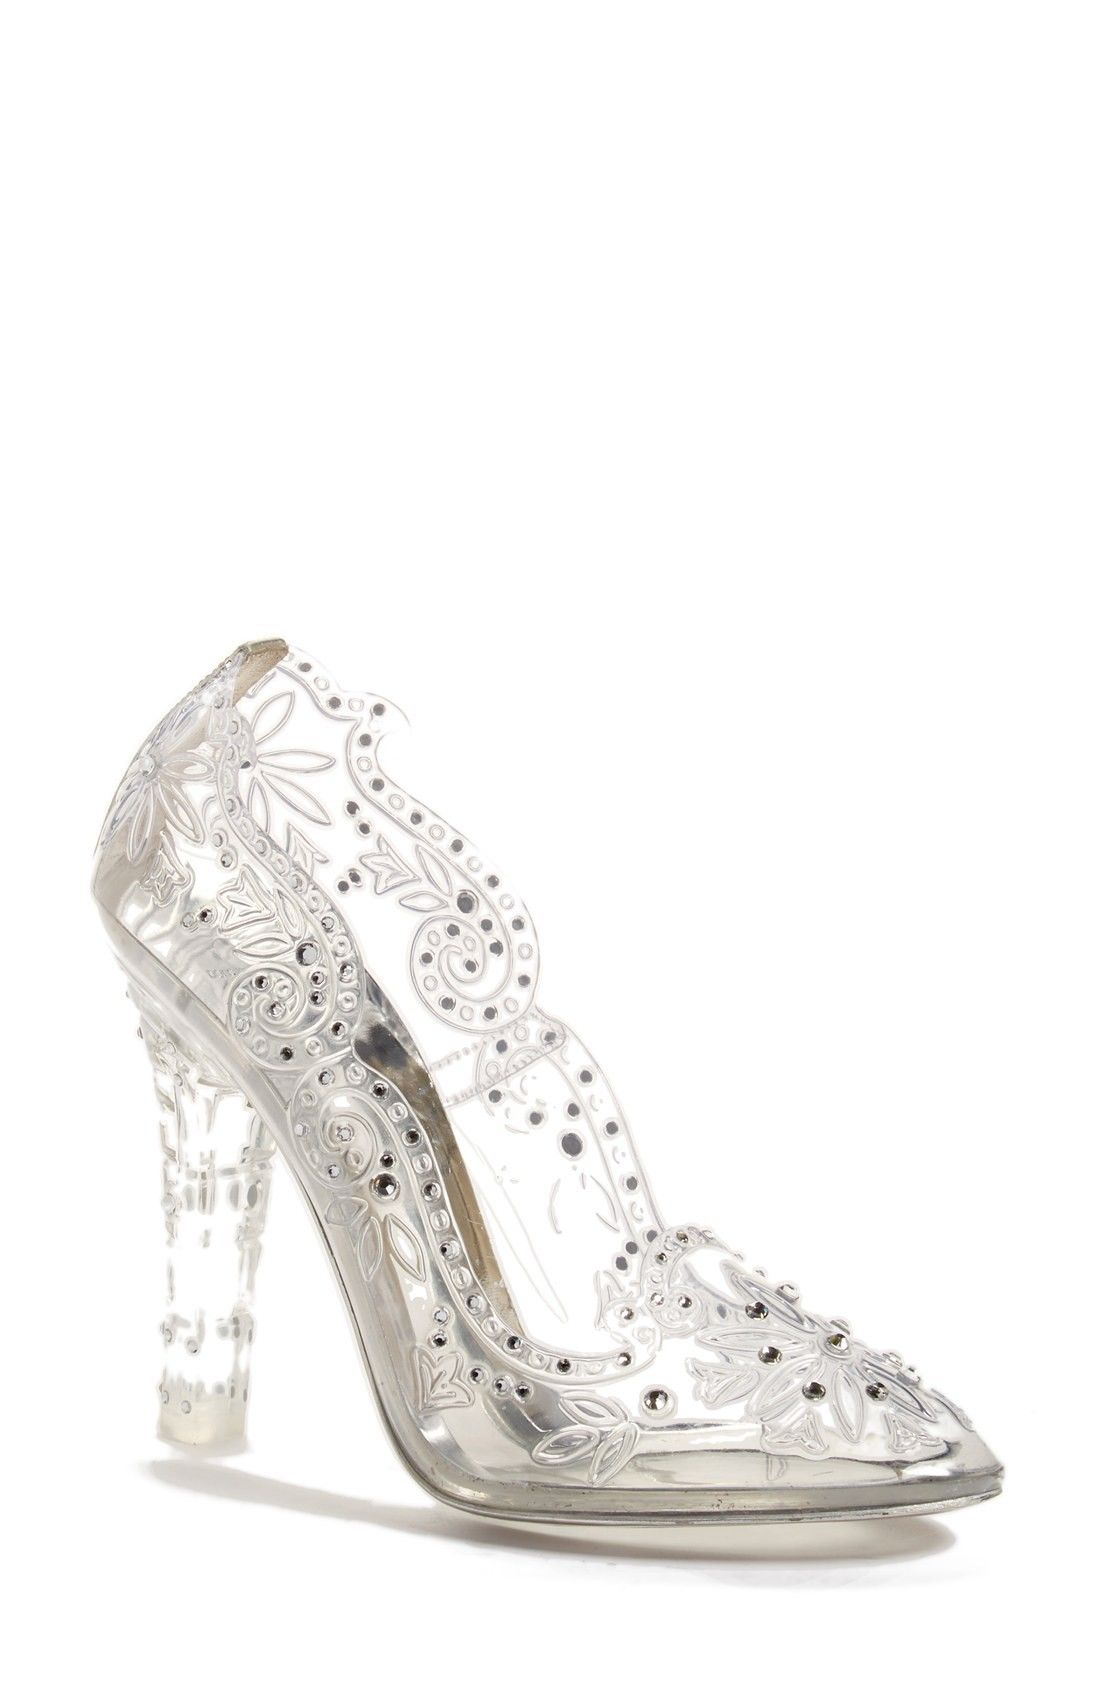 Gl Slipper Pump Wedding Shoes By Dolce Gabbana Affiliate